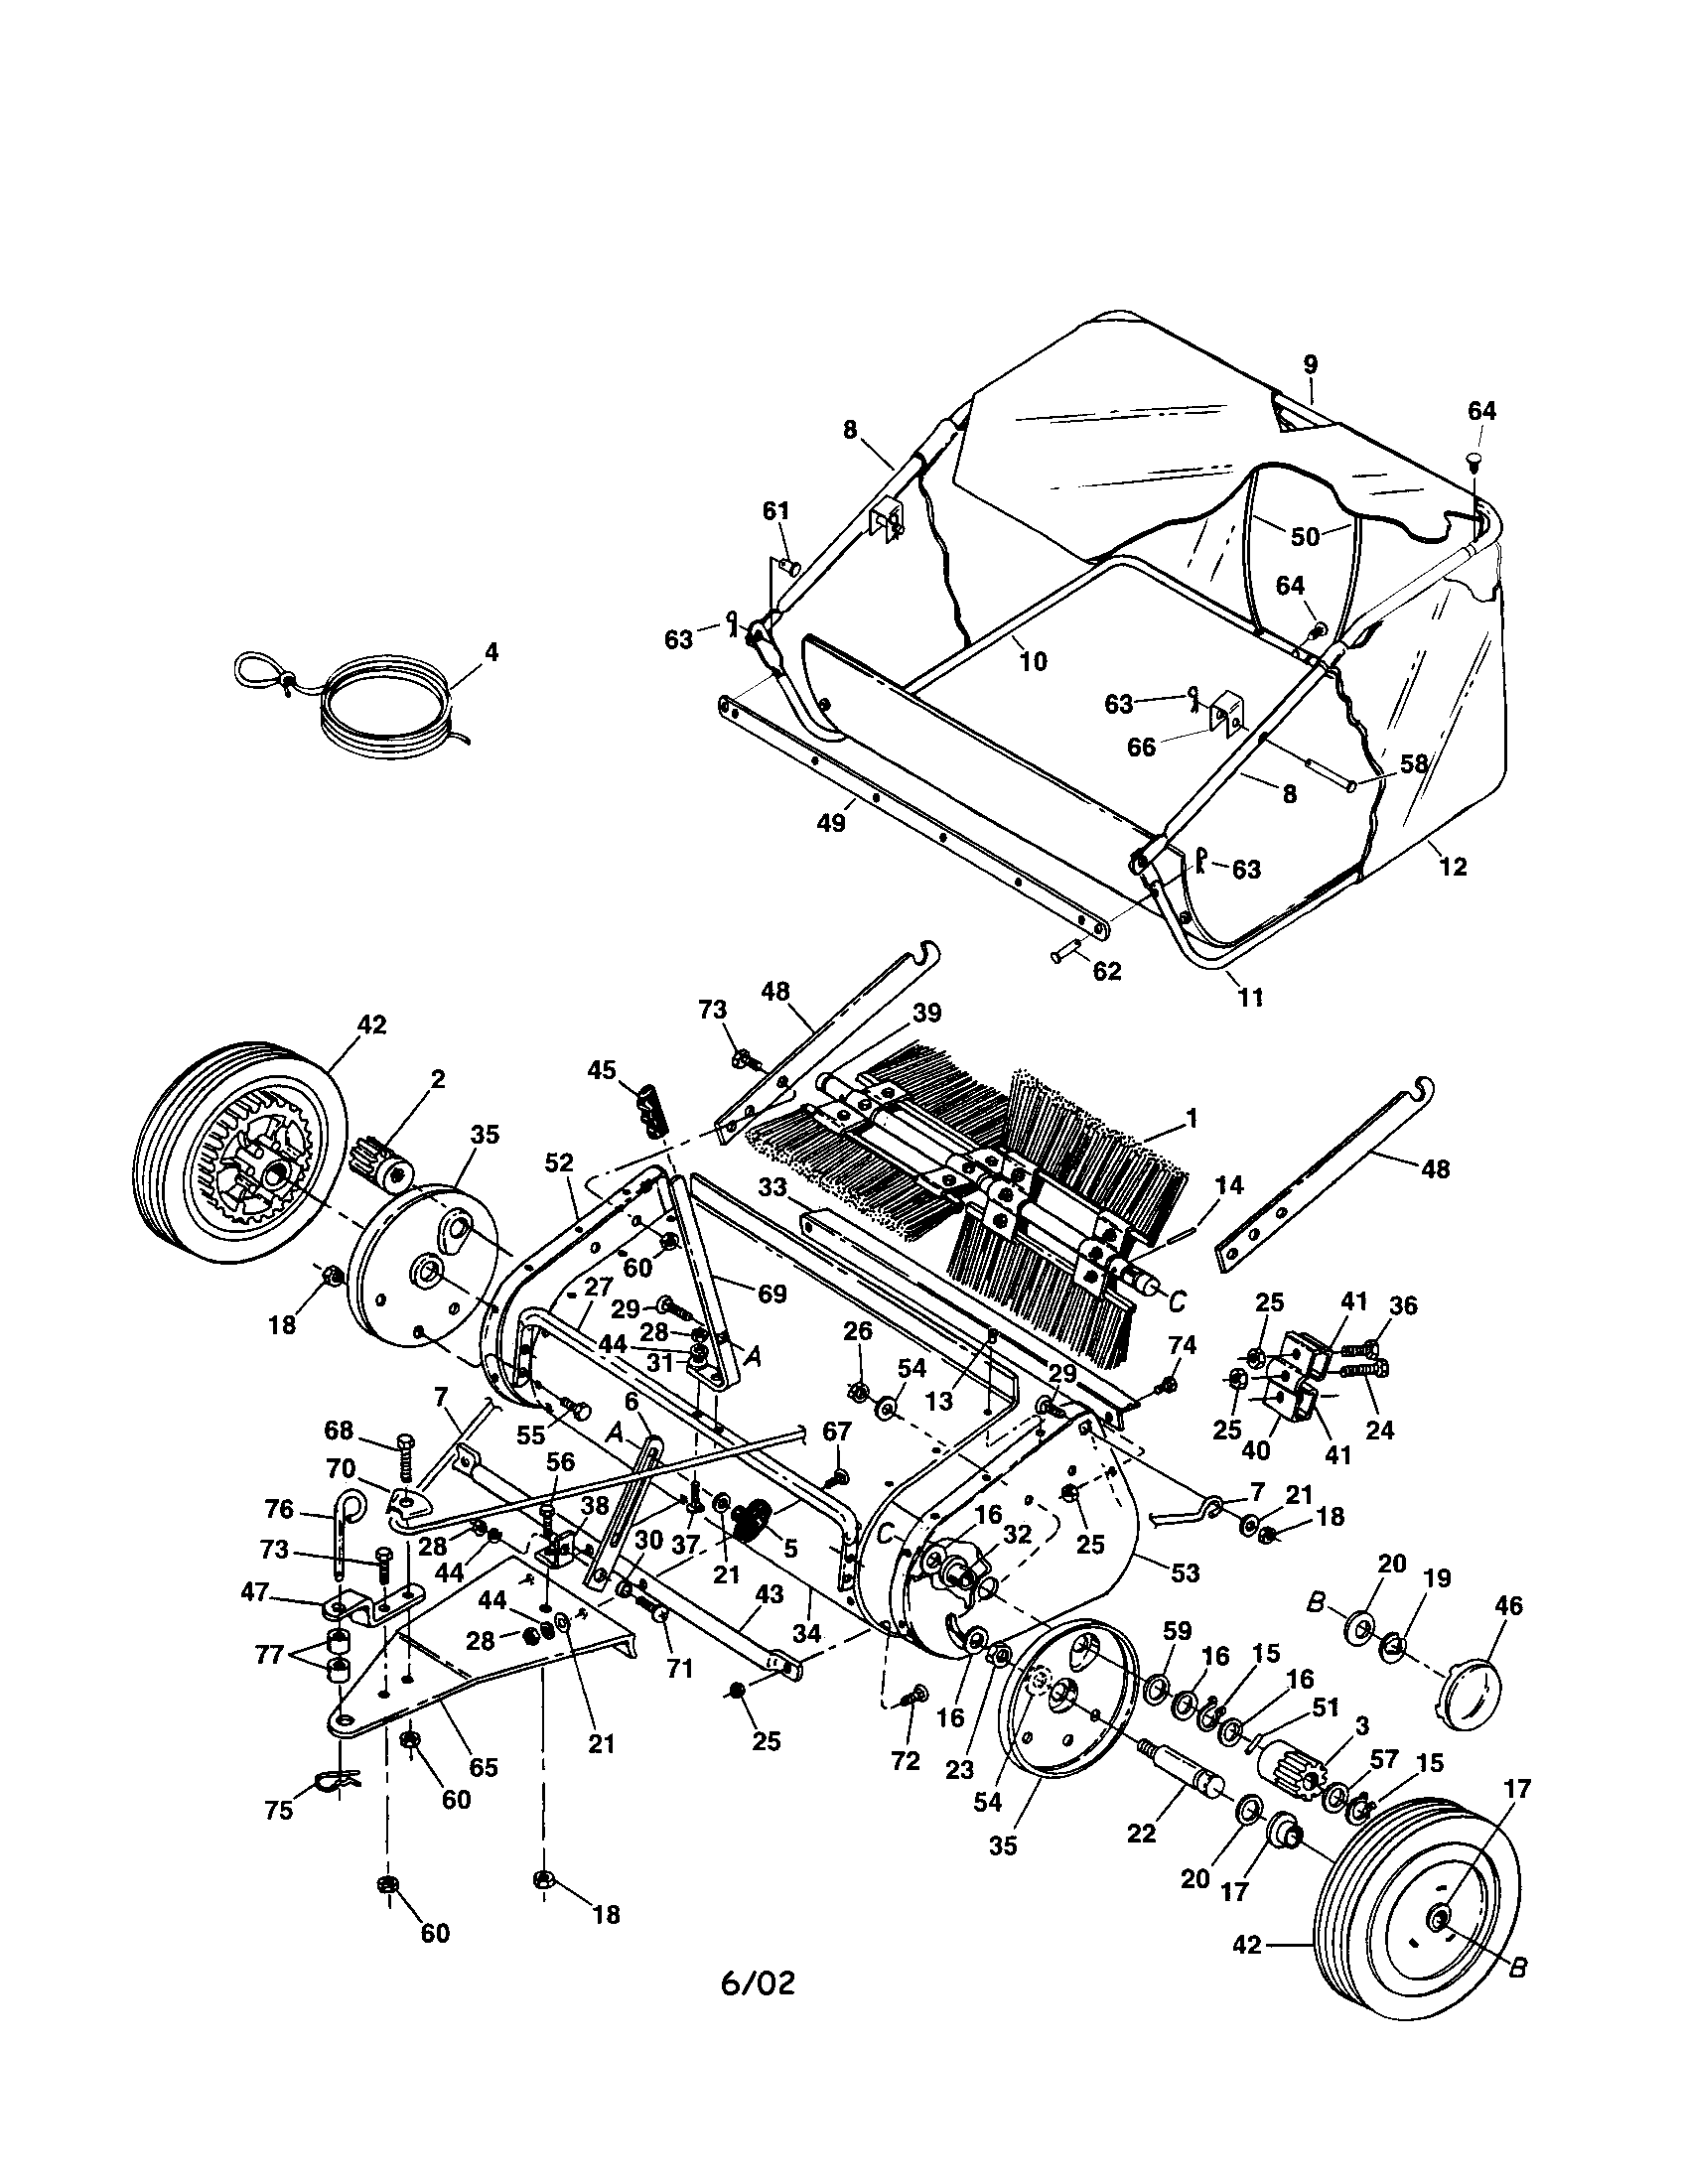 Craftsman model 486241322 lawn sweeper genuine parts